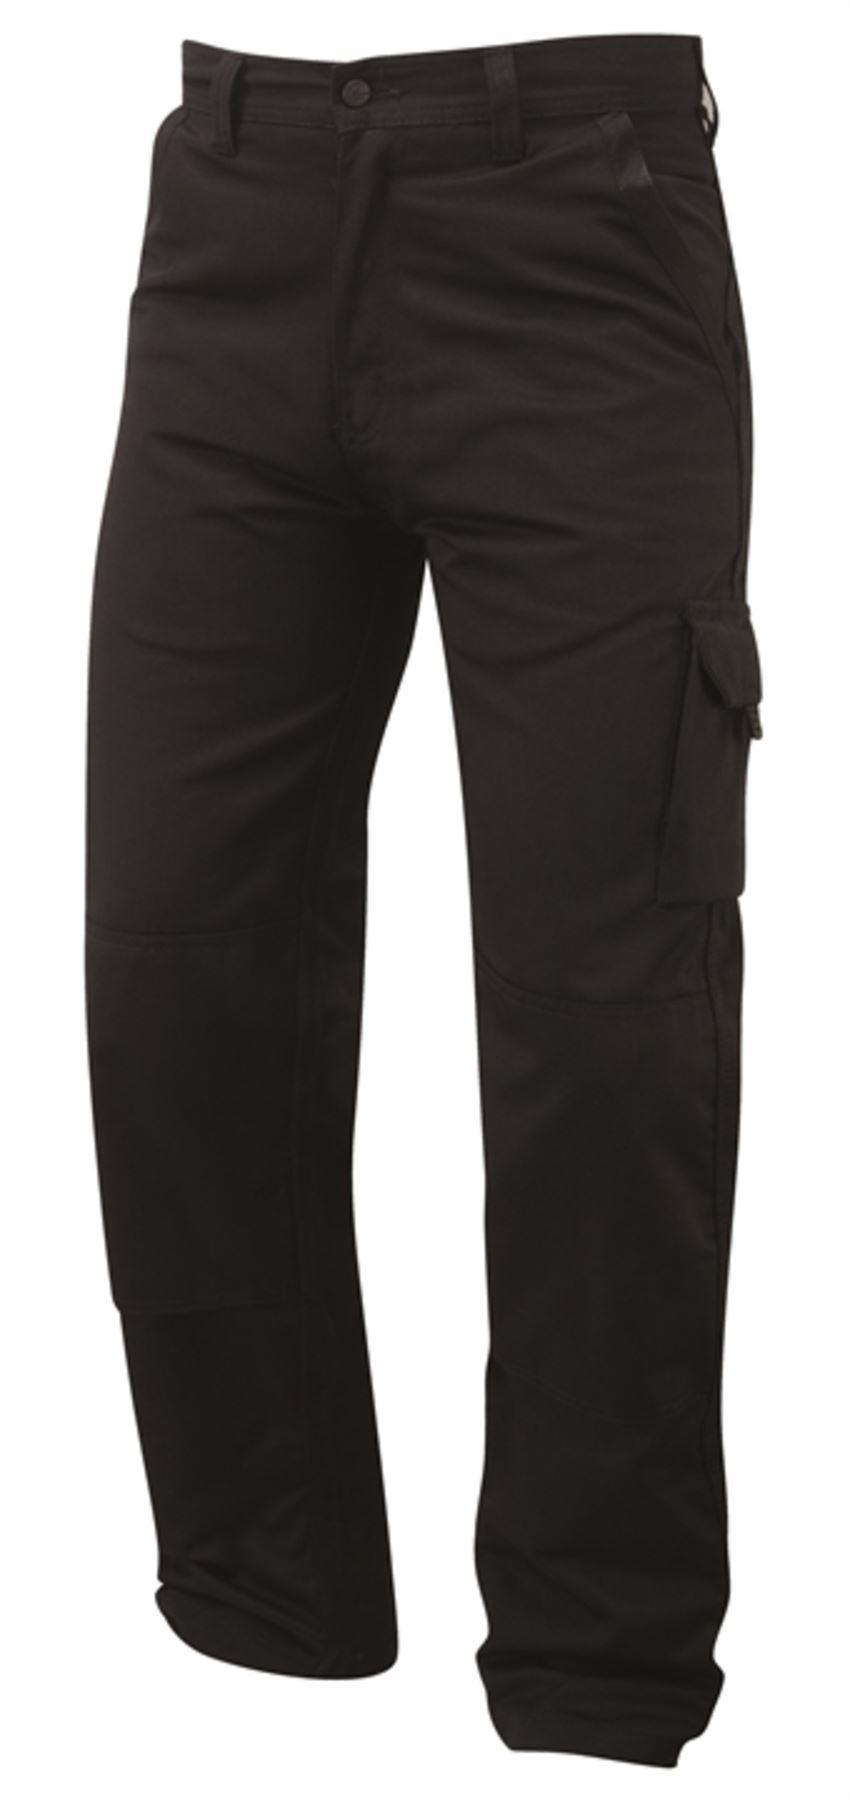 Orn Heron Kneepad Combat Trousers - Black|52W29L